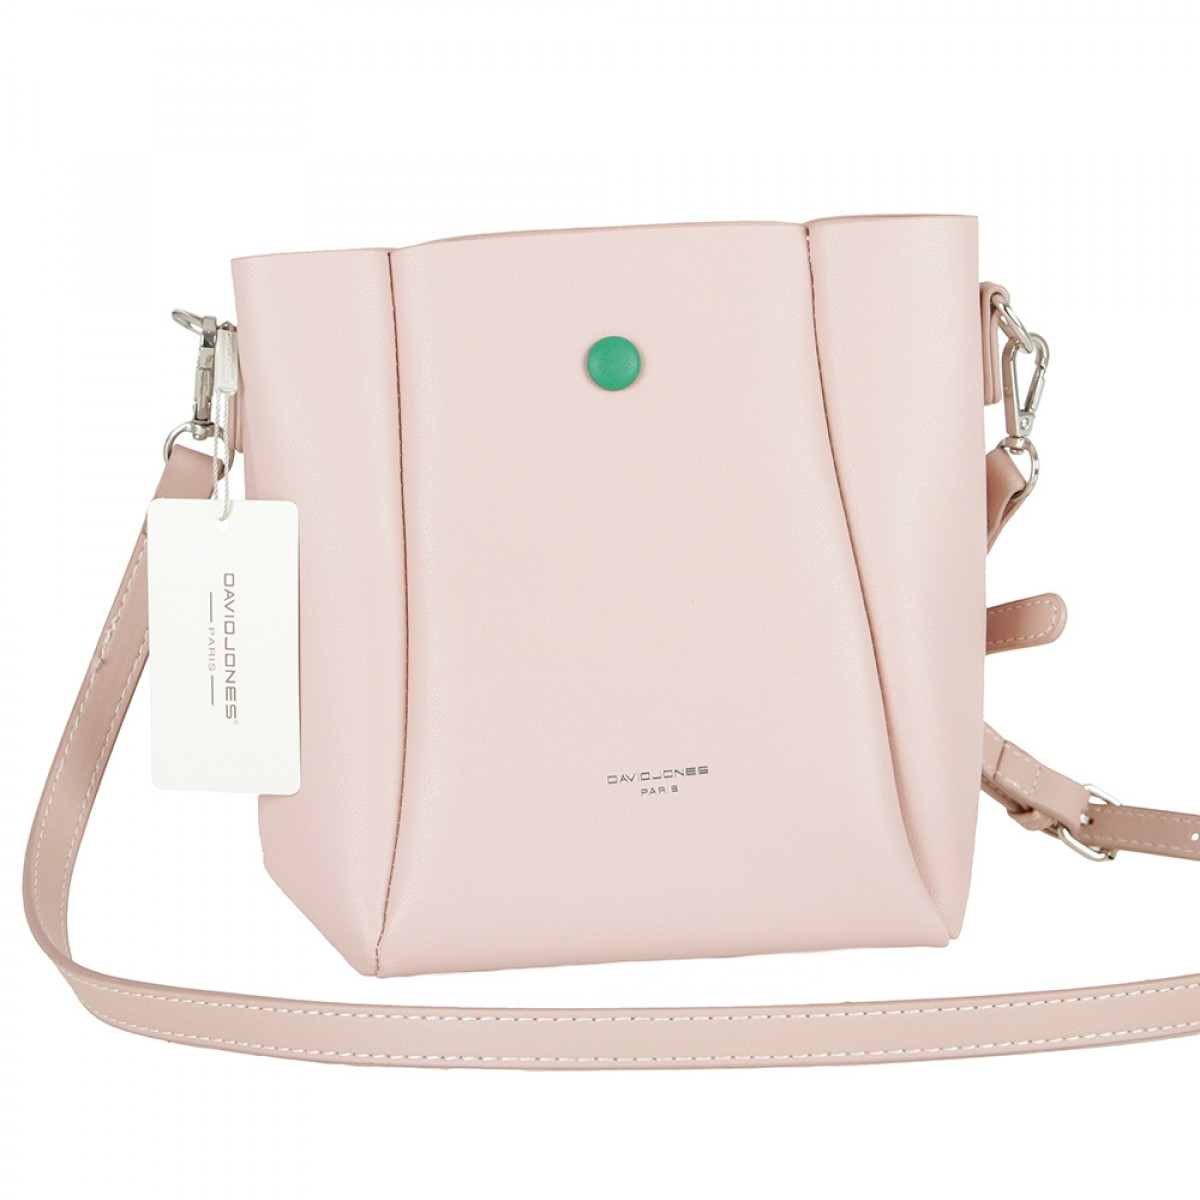 Жіноча сумка David Jones 5991-1 PINK